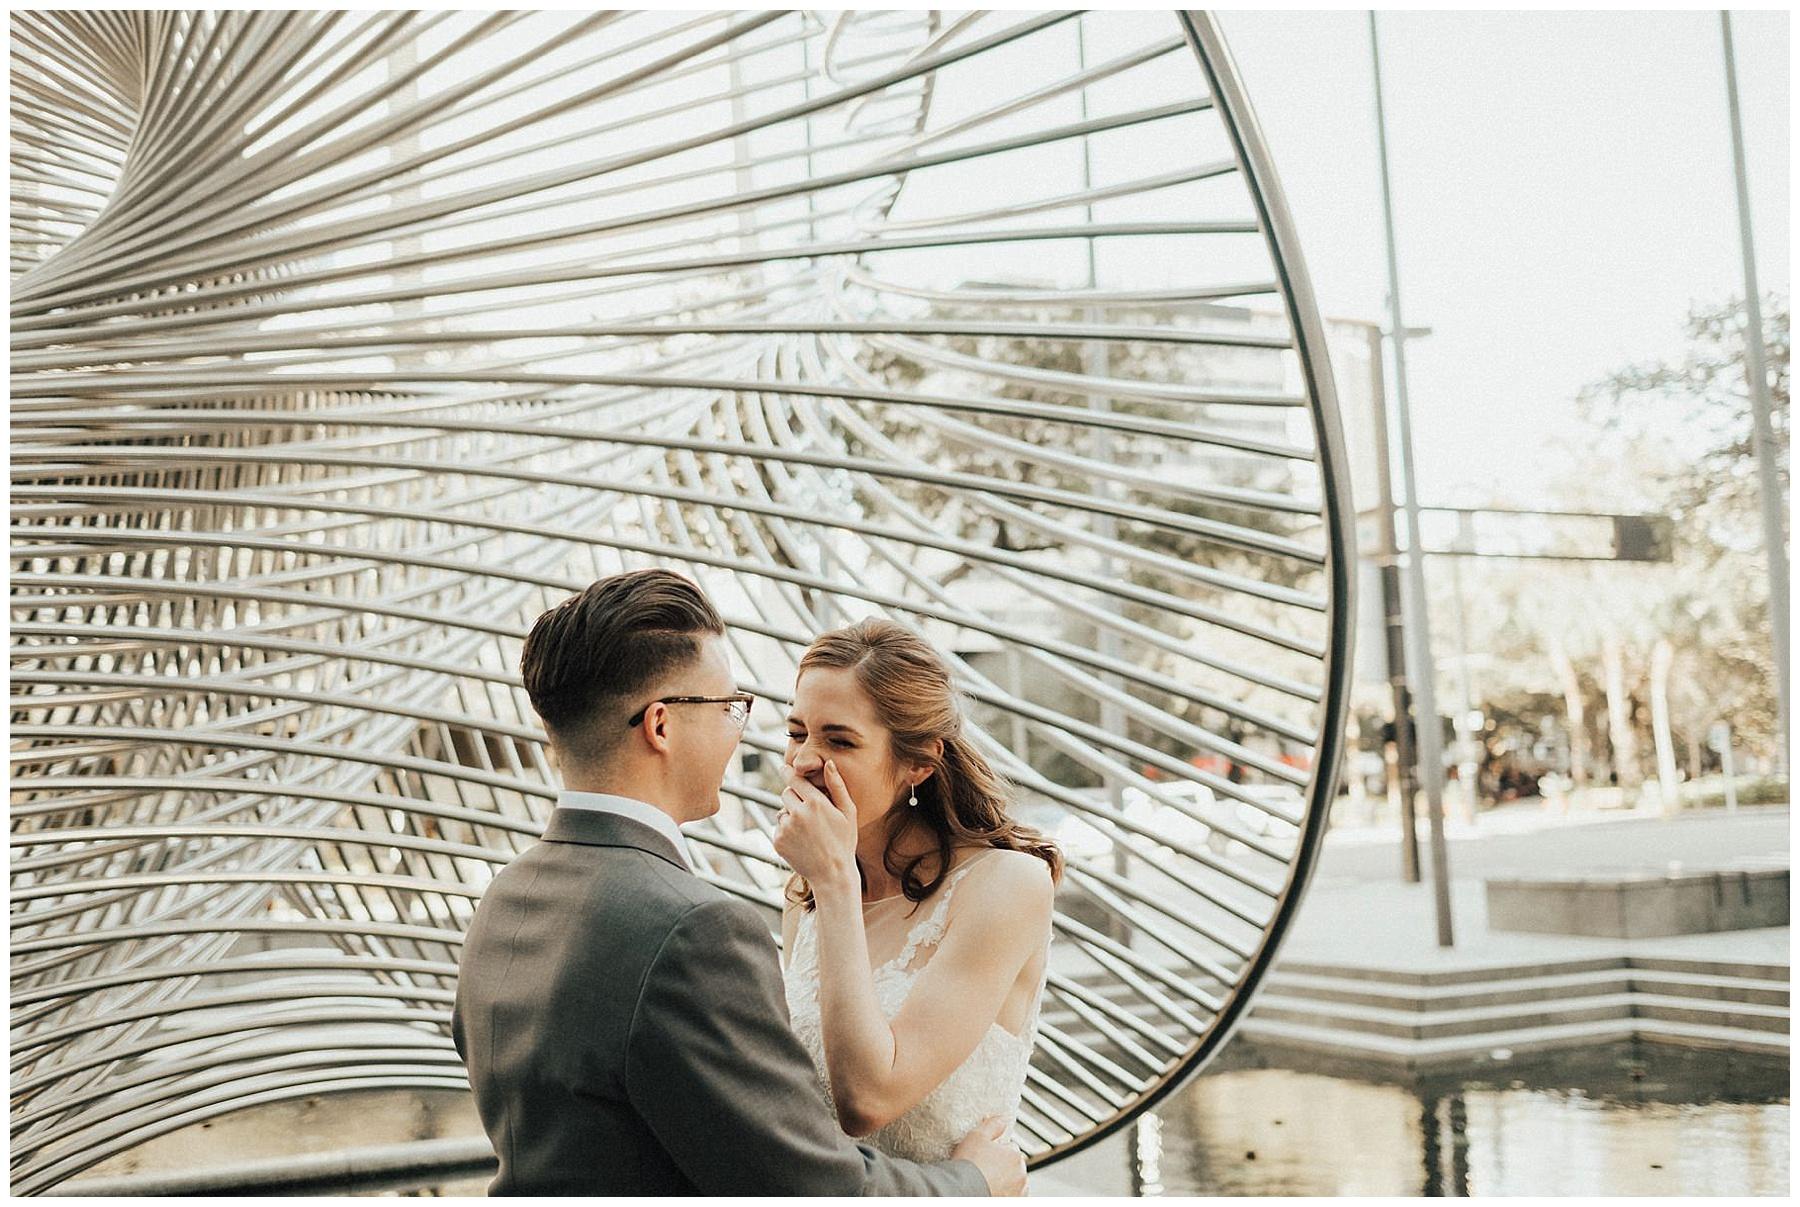 Kylie Garden Wedding Tampa Wedding Photographer-51.jpg